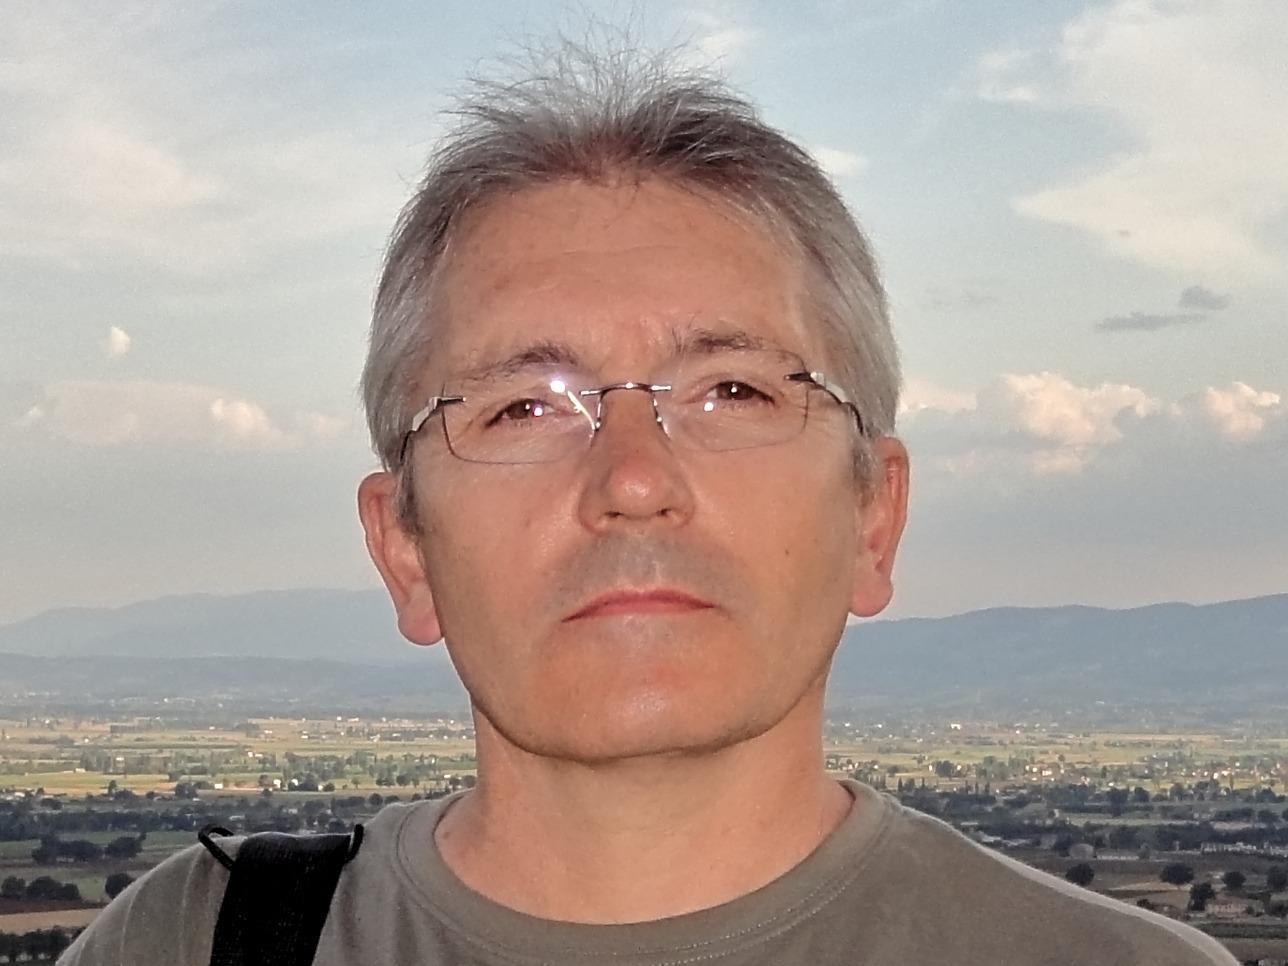 Jean-Marc Sarat